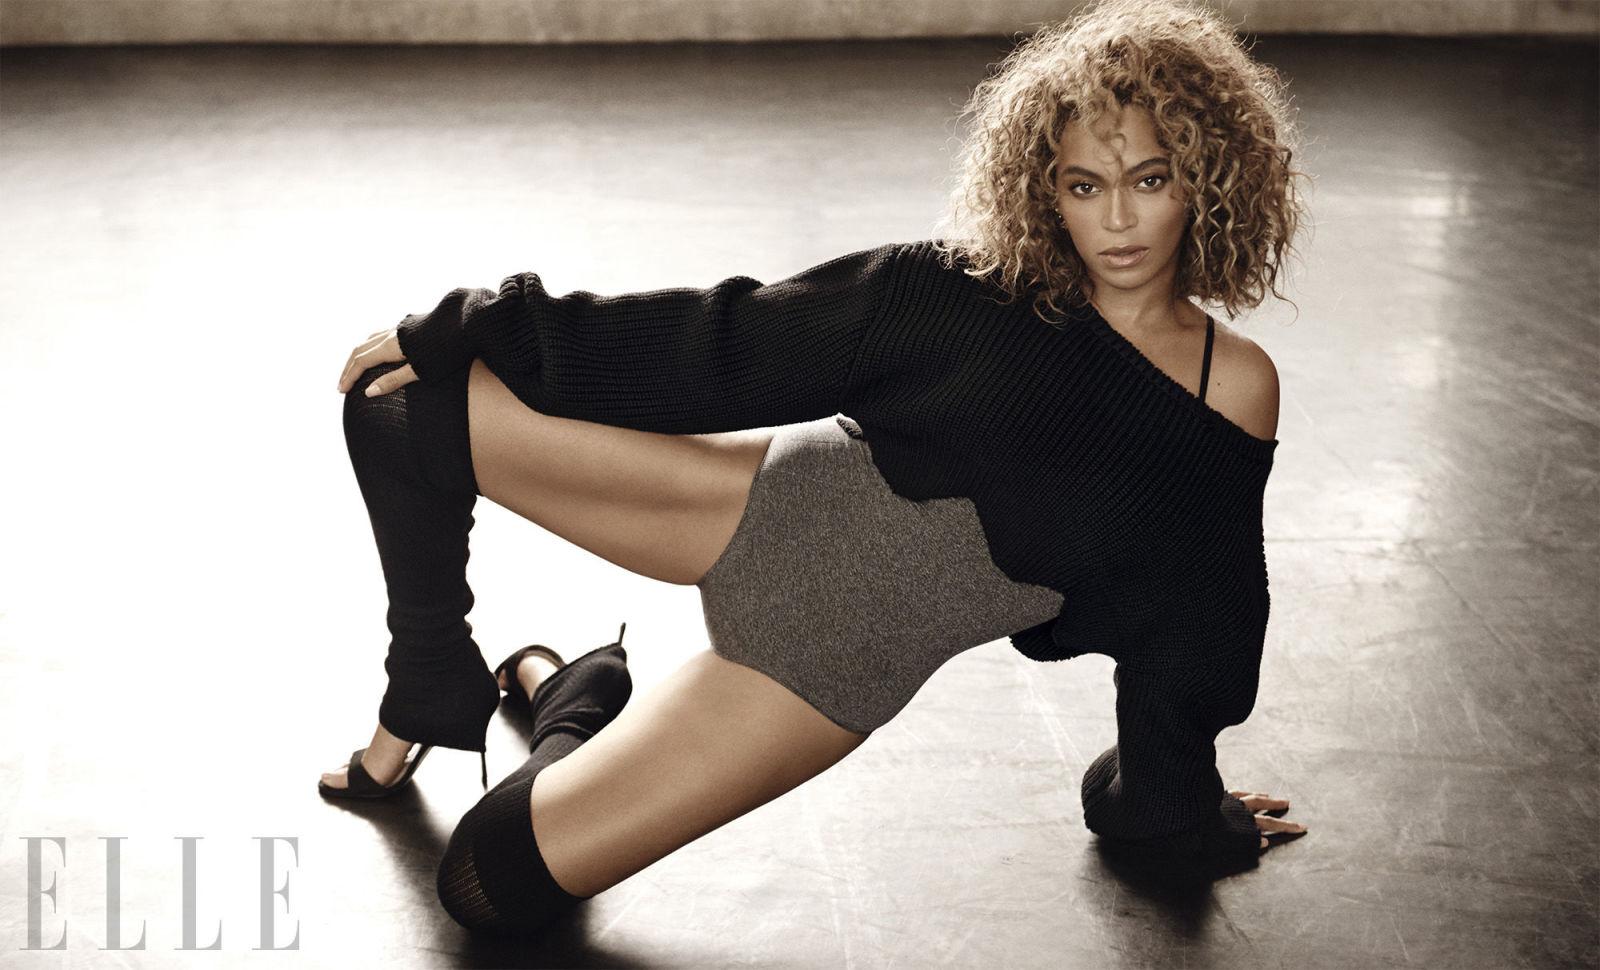 Beyoncé    Gallery-1459546133-beyonce-elle-1